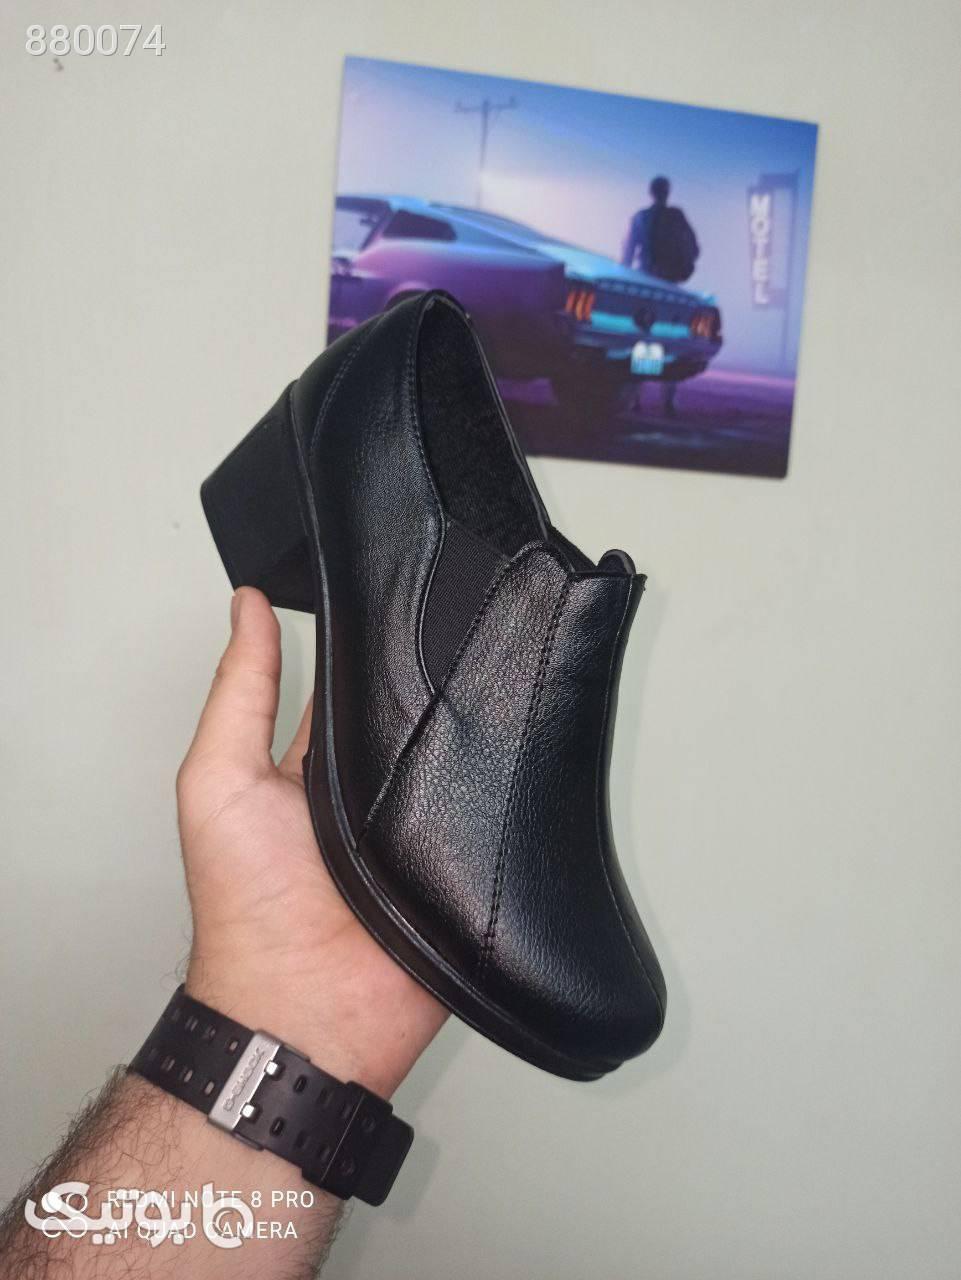 کفش جدید شرانگ هپی زیره پیو پاخور عالی مشکی كفش پاشنه بلند زنانه